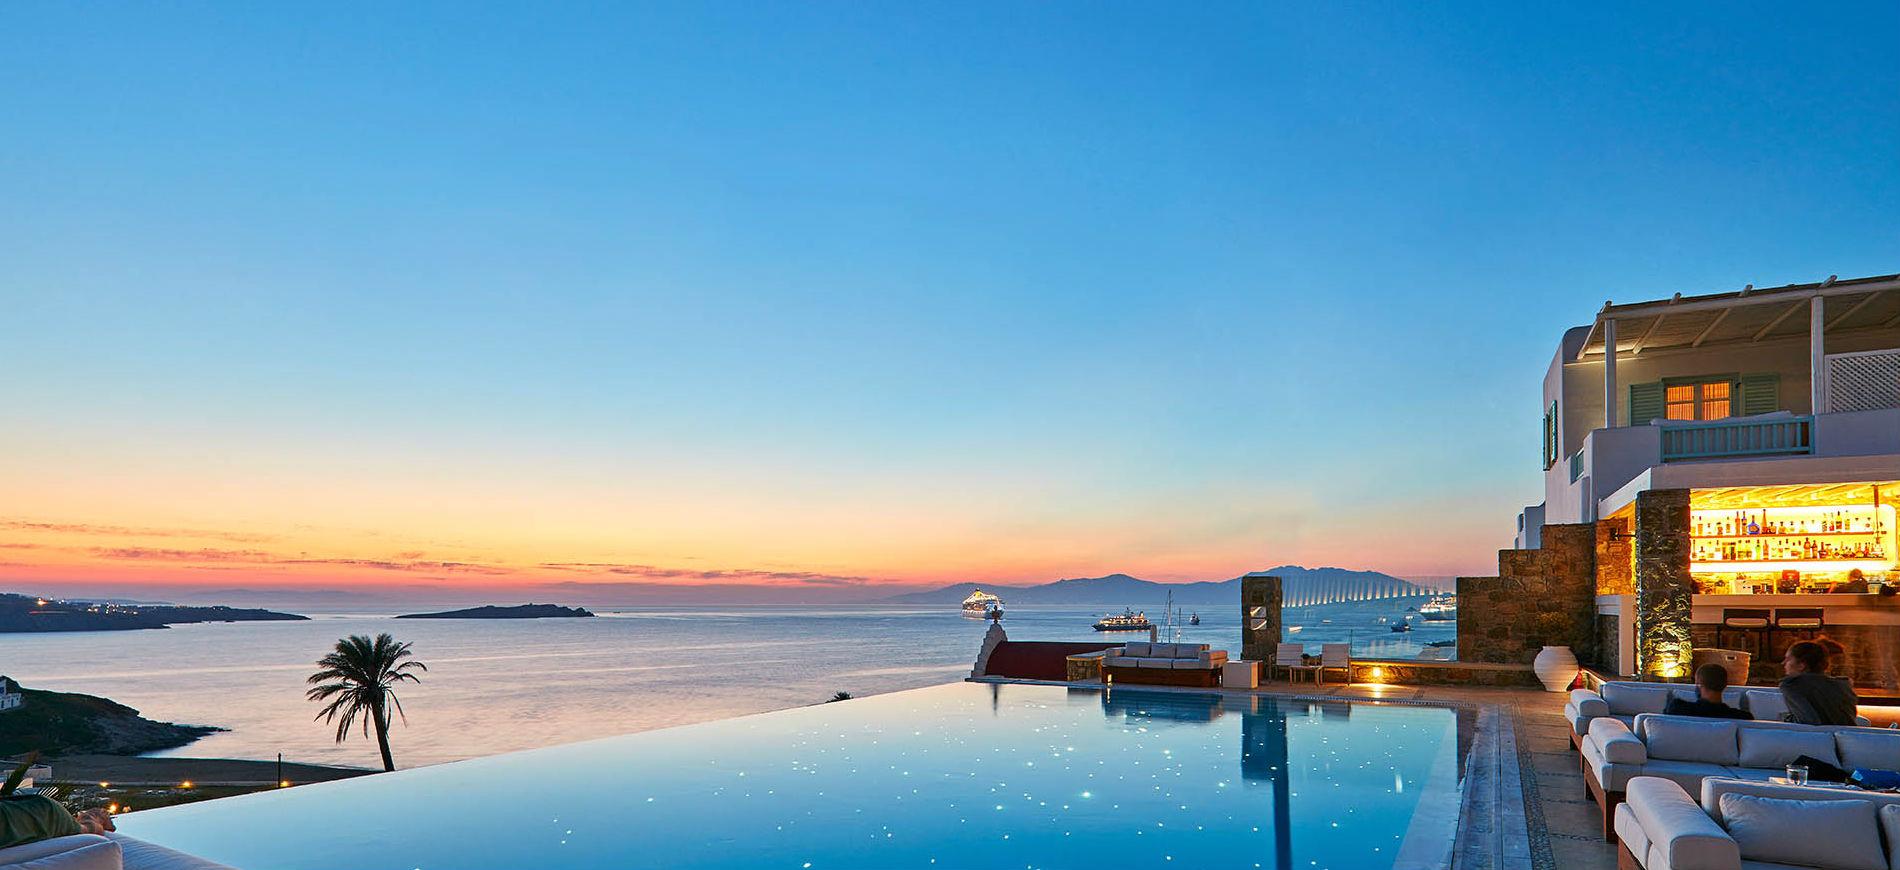 Bill & Coo Hotel - Mykonos